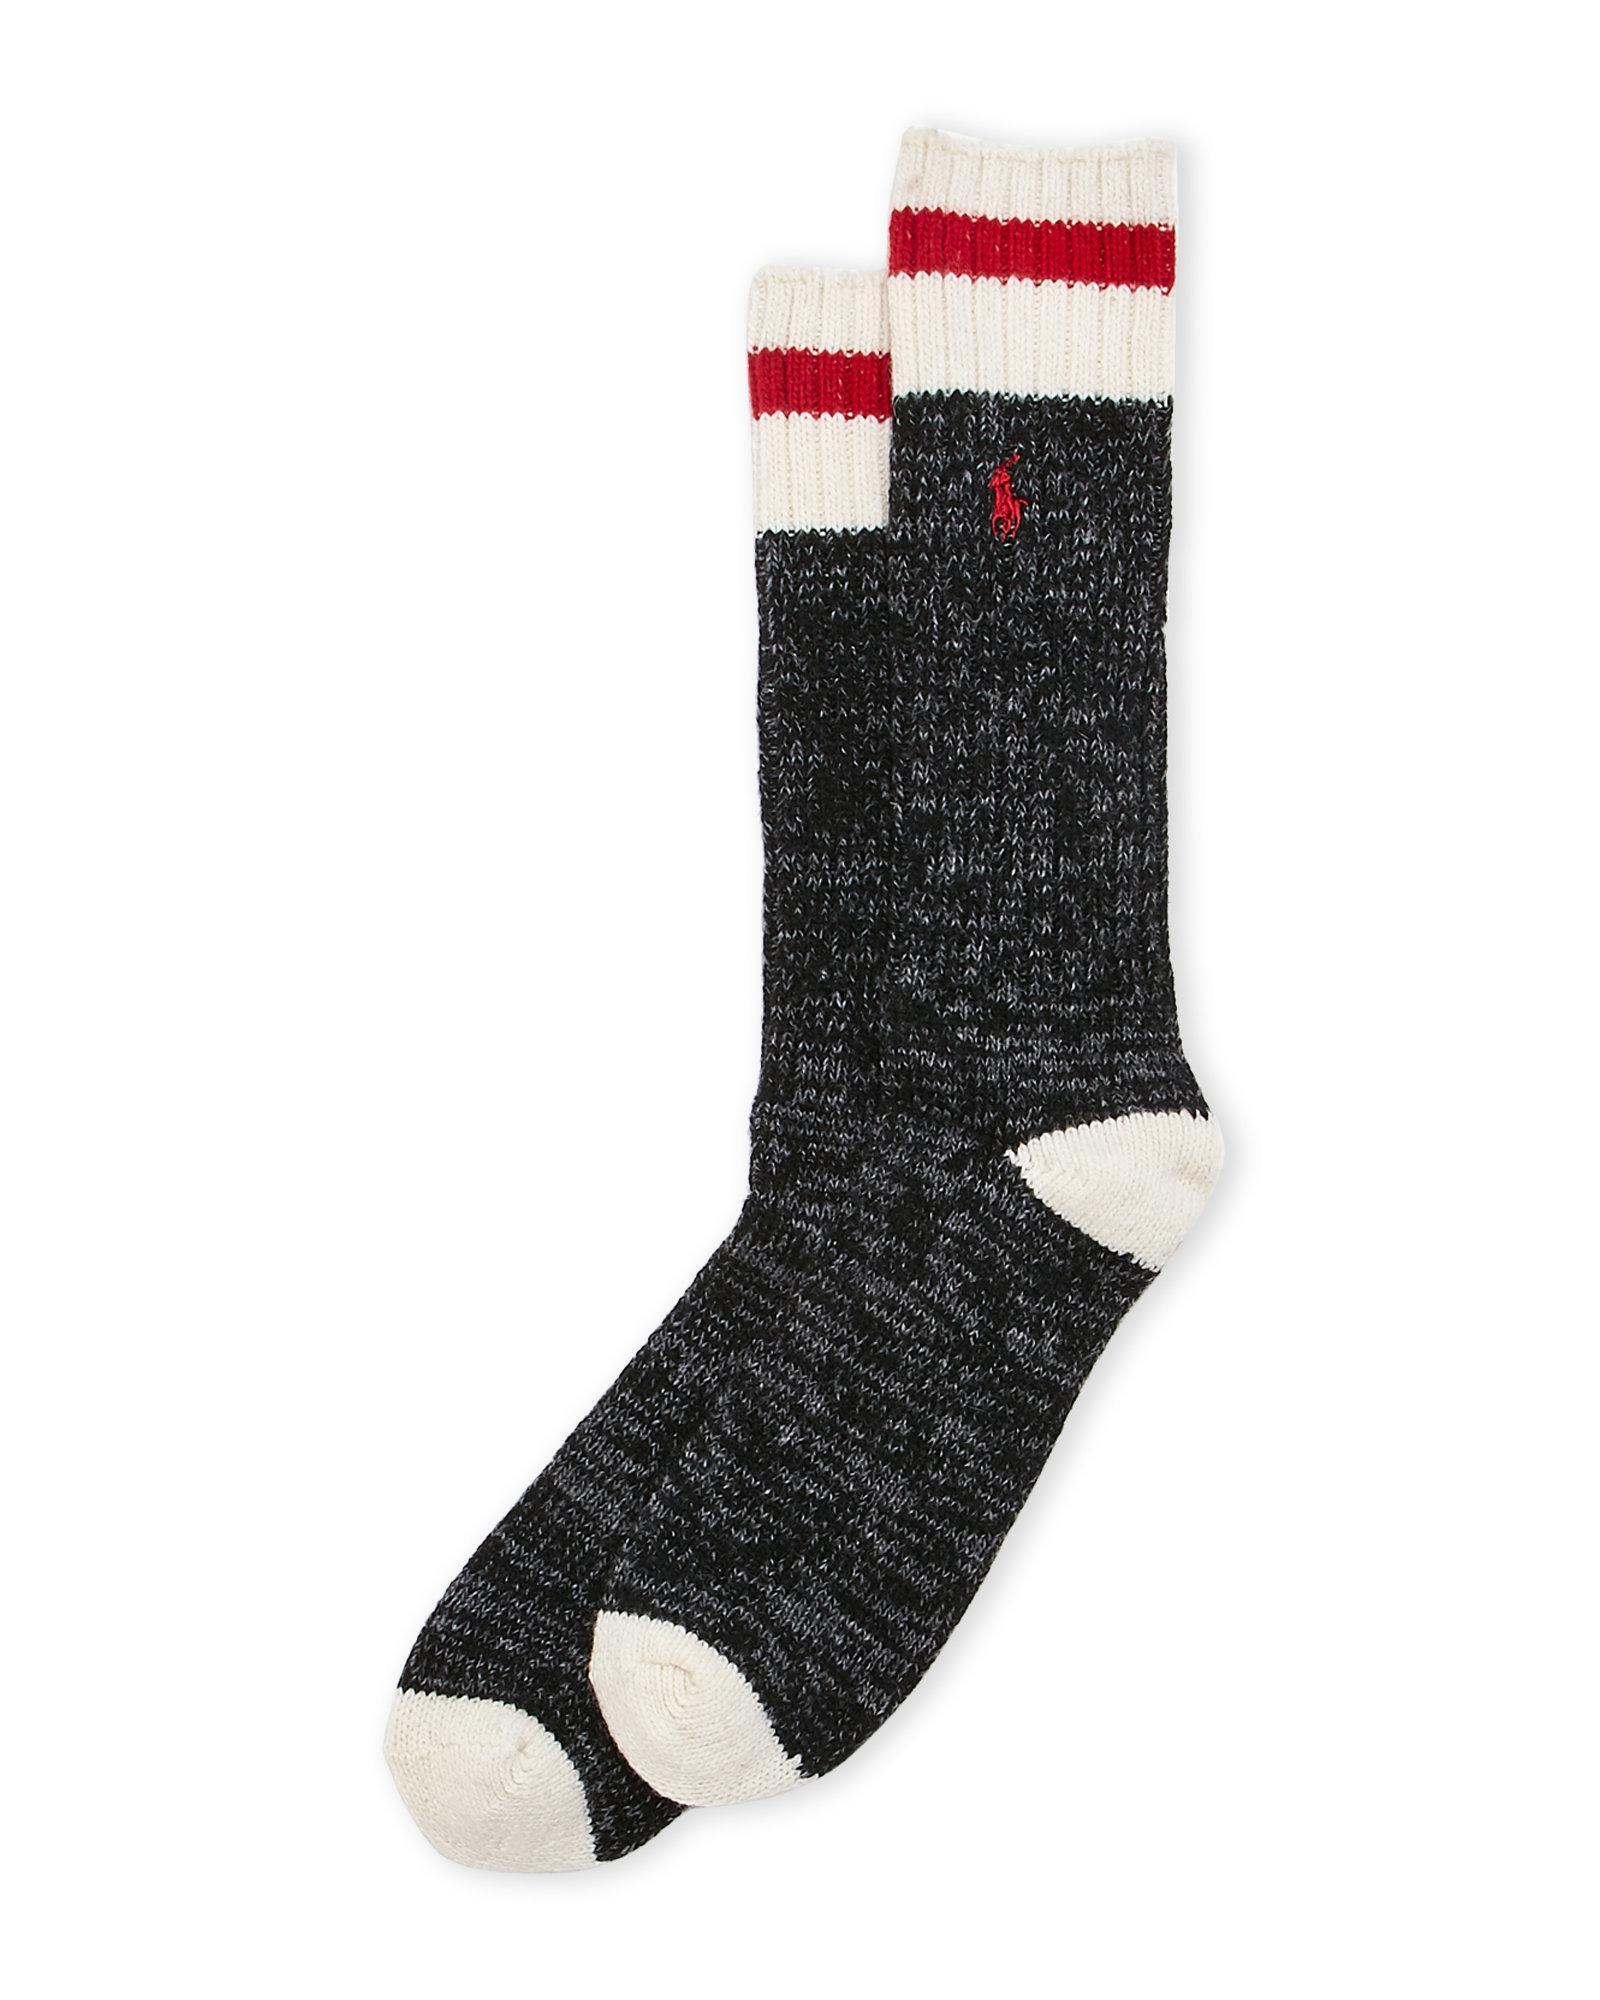 Lyst - Polo Ralph Lauren Raglan Boot Socks in Black for Men ac36956d649